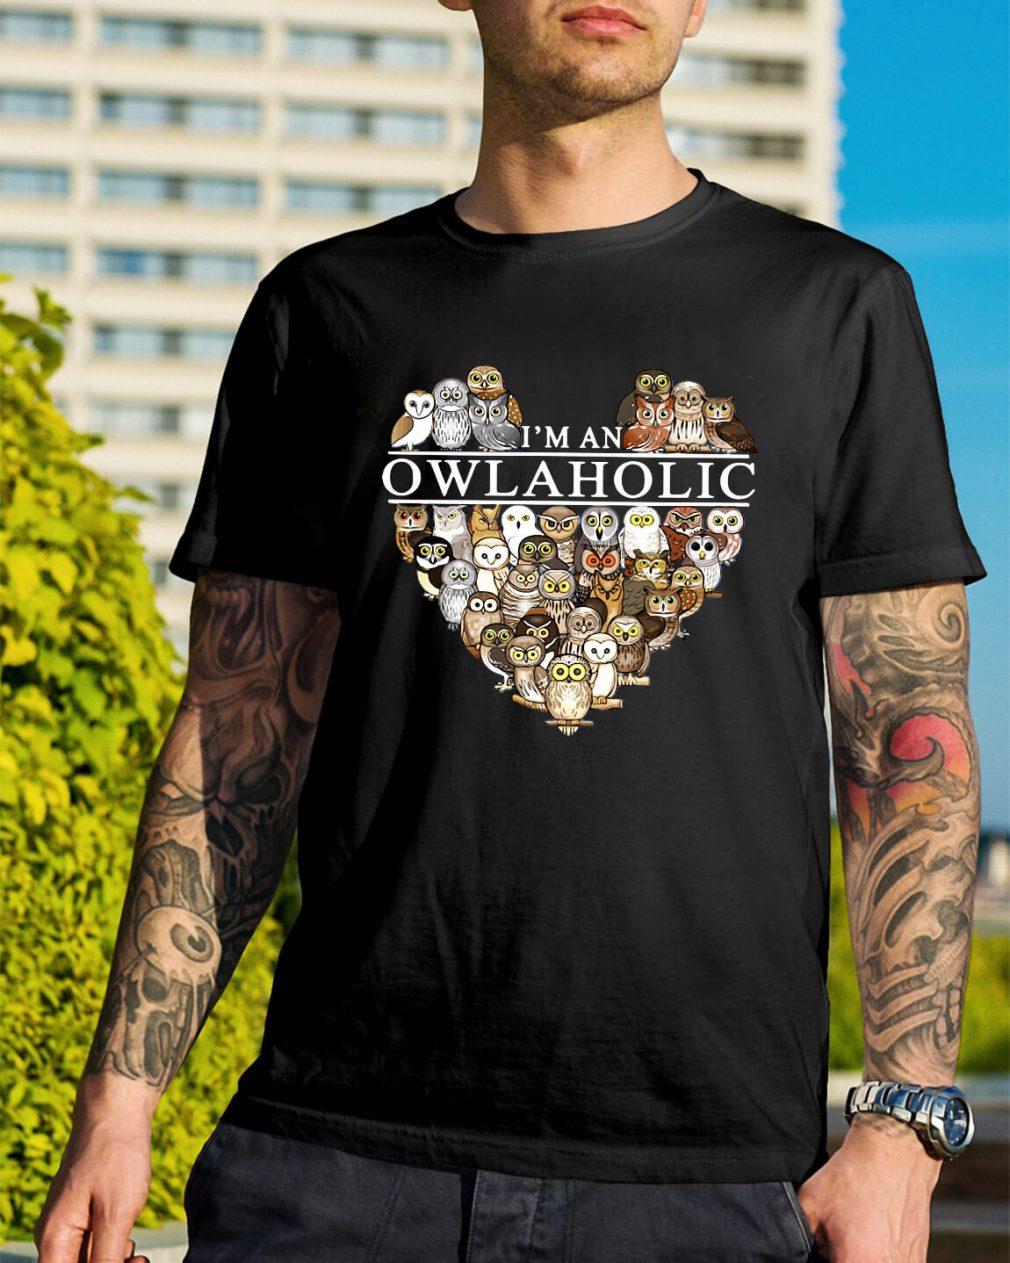 I'm an owl aholic shirt